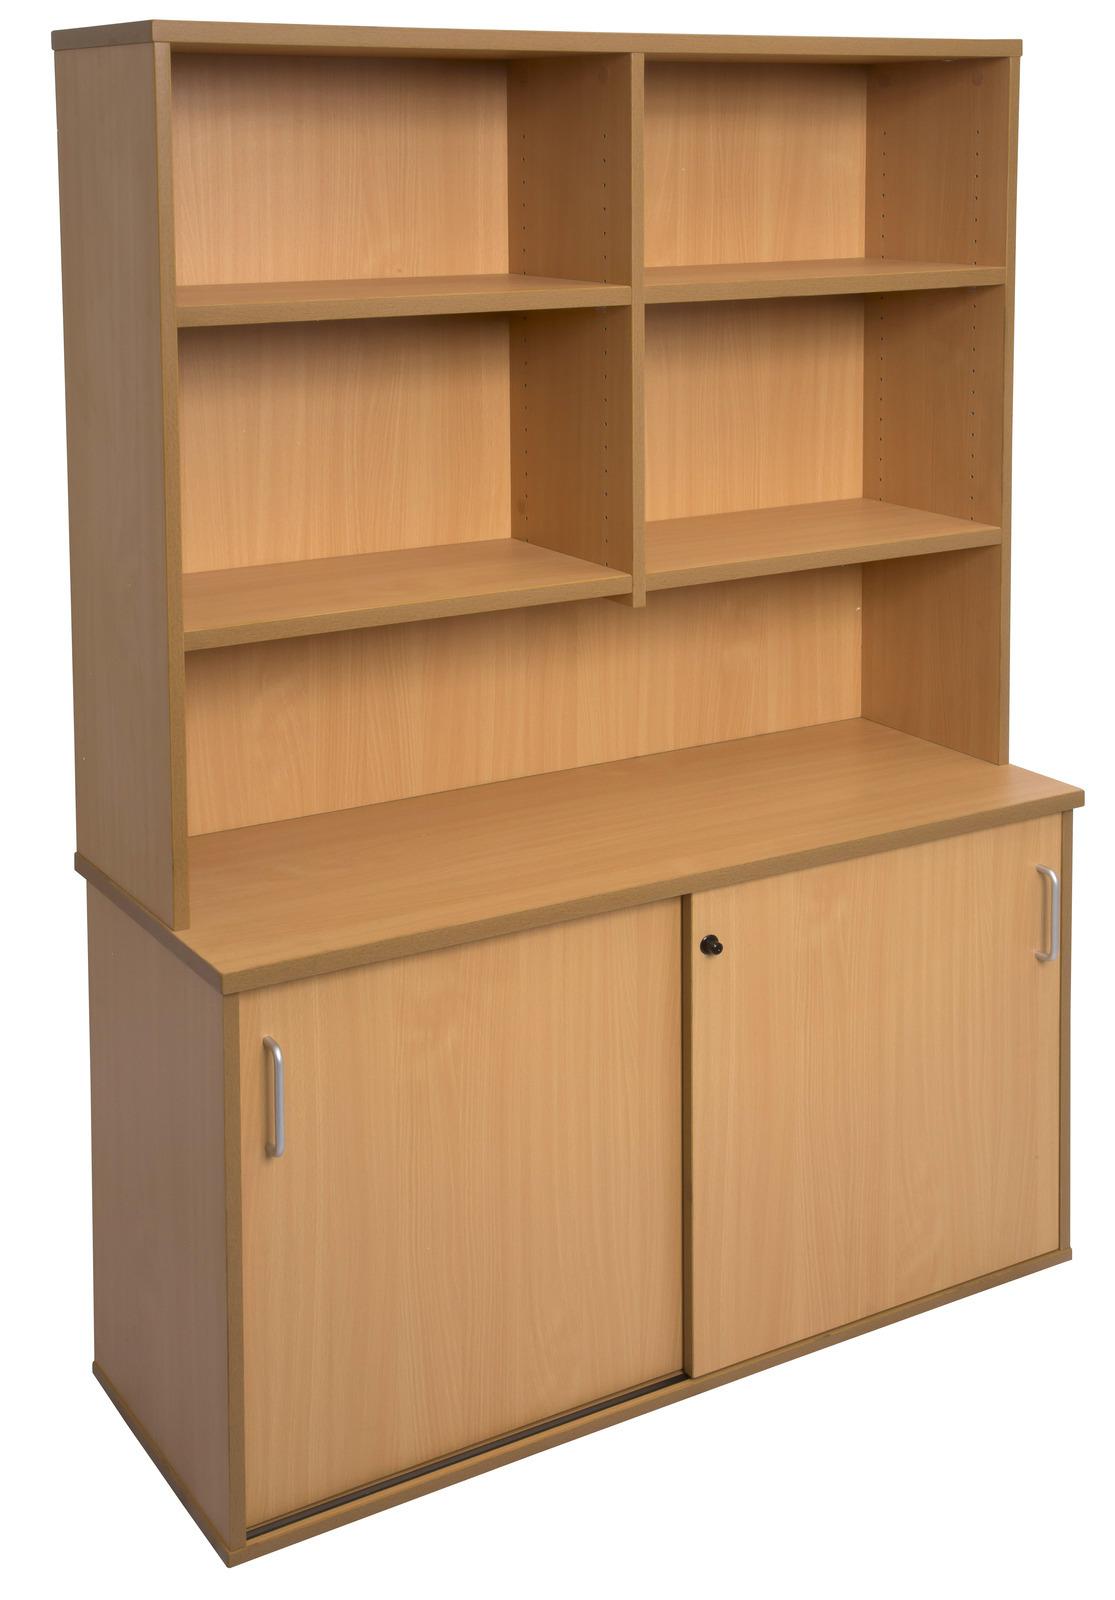 Rapid credenza with storage hutch office stock - Mobile credenza ...